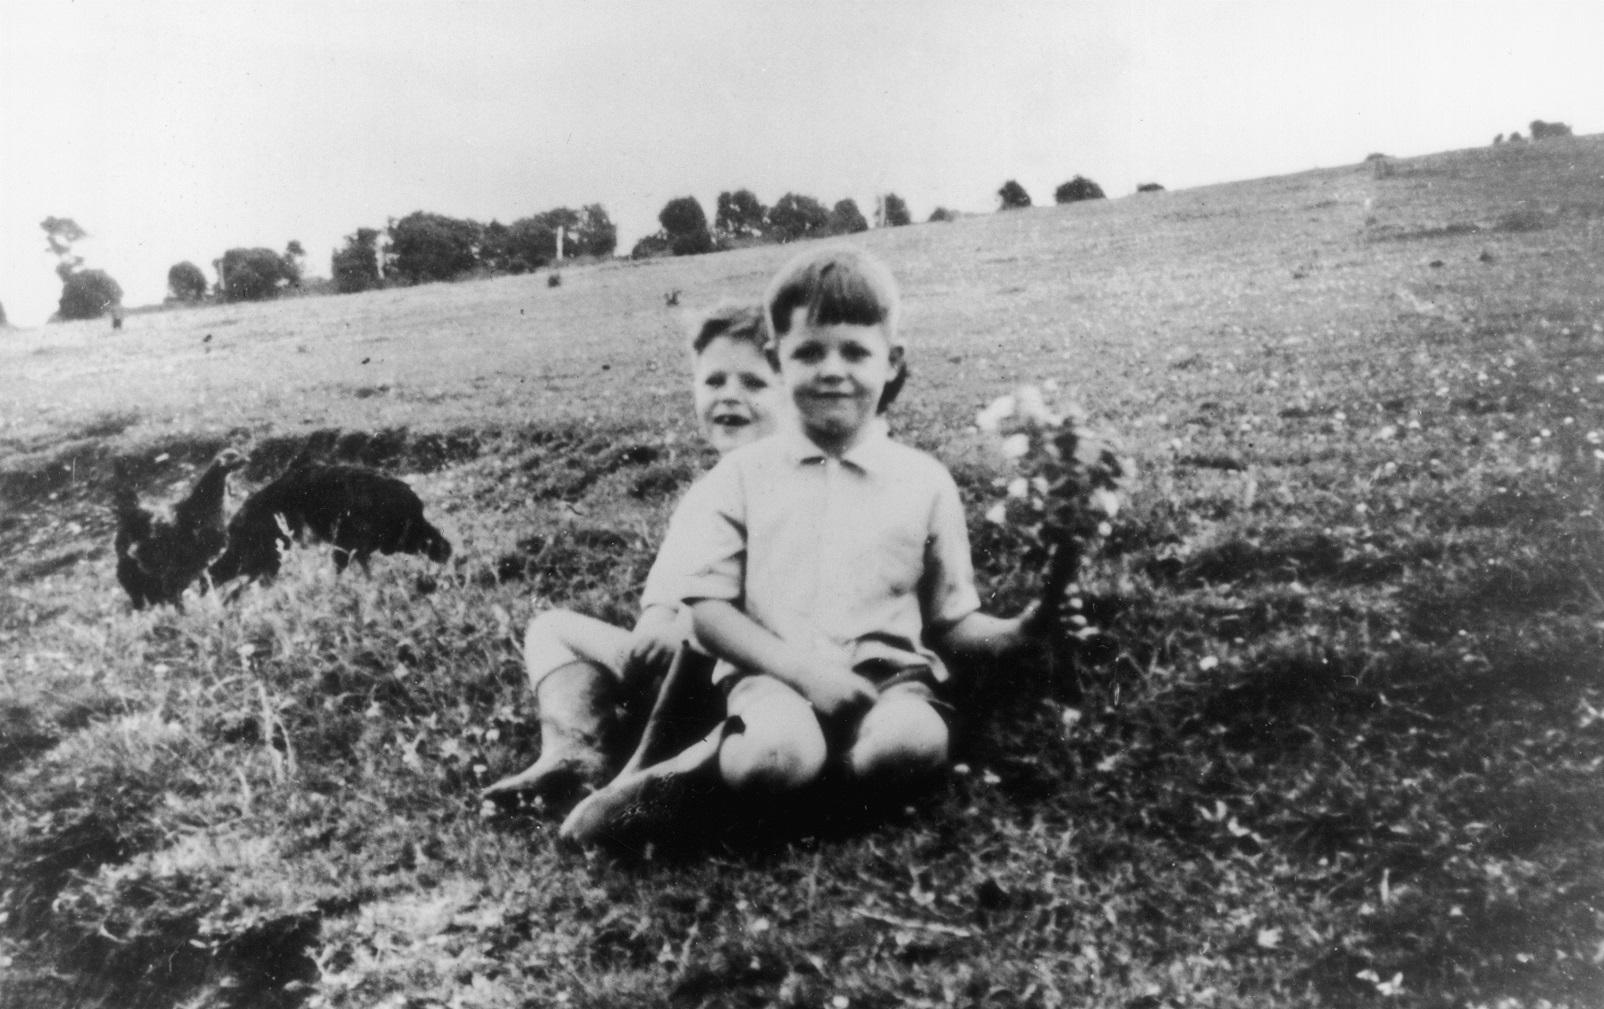 Paul McCartney age 6, 1948